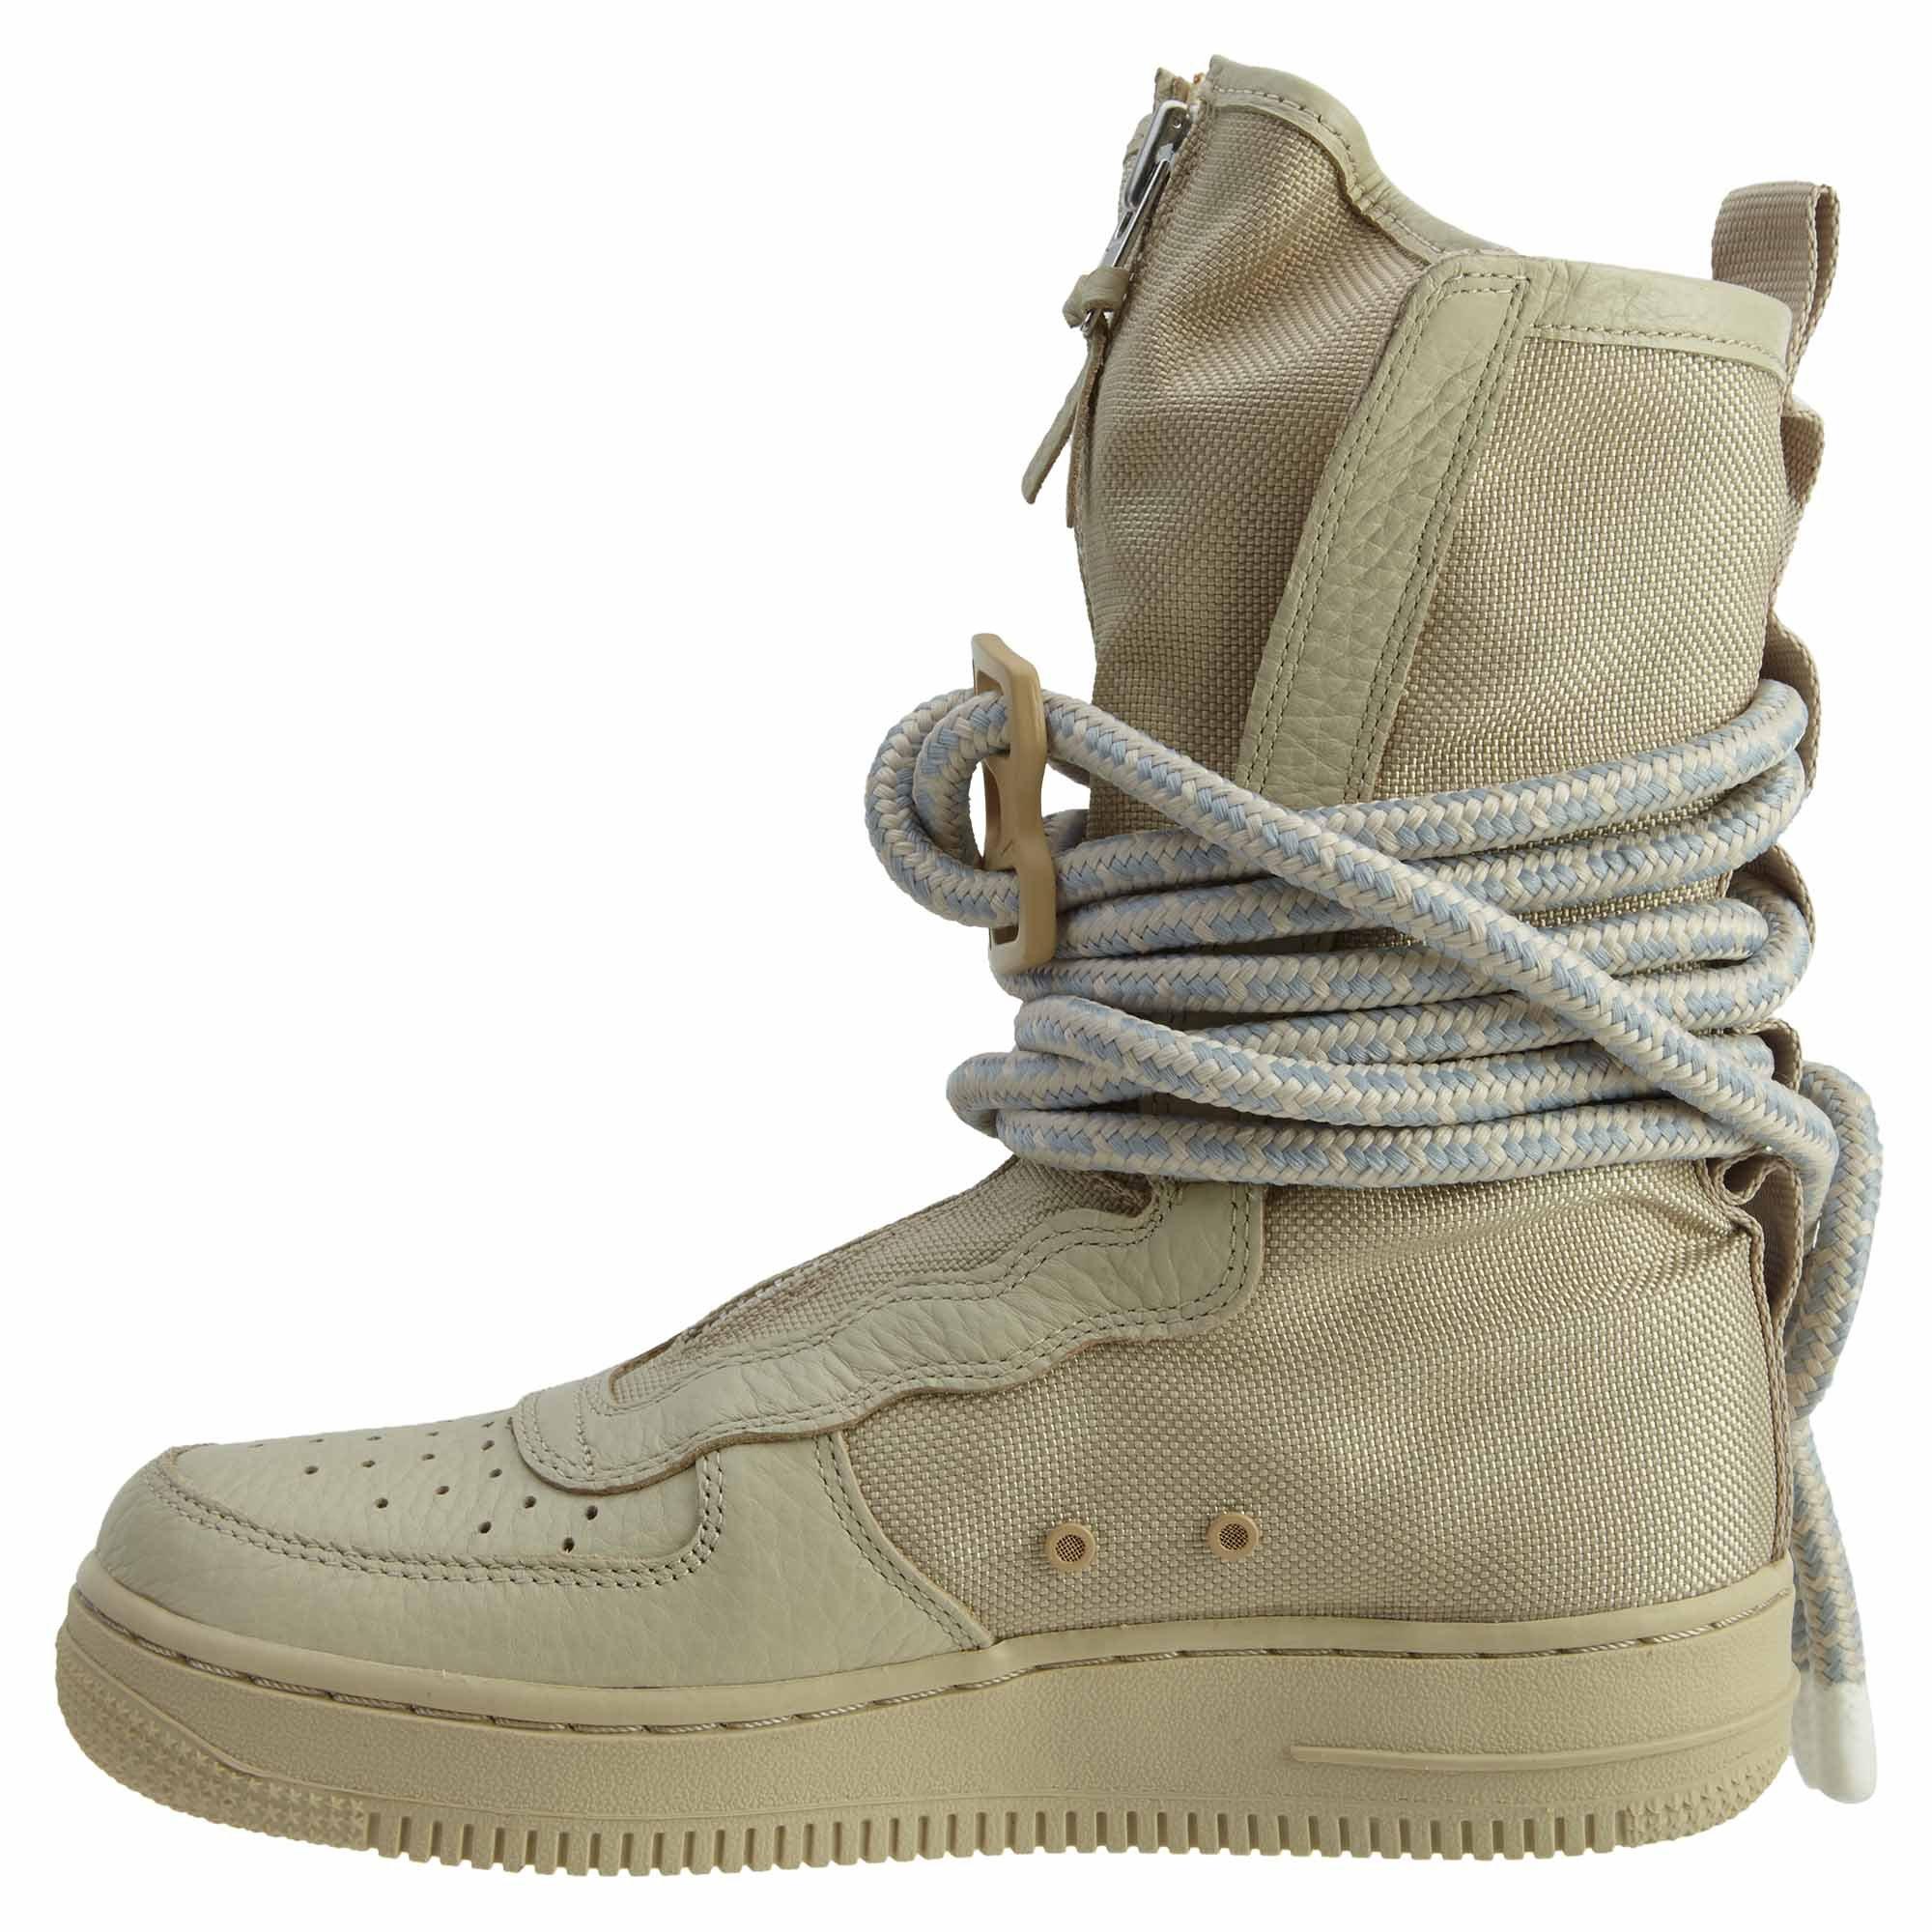 Nike Sf Af1 Hi Womens Style : AA3965-200 Size : 8.5 B(M) US by NIKE (Image #3)